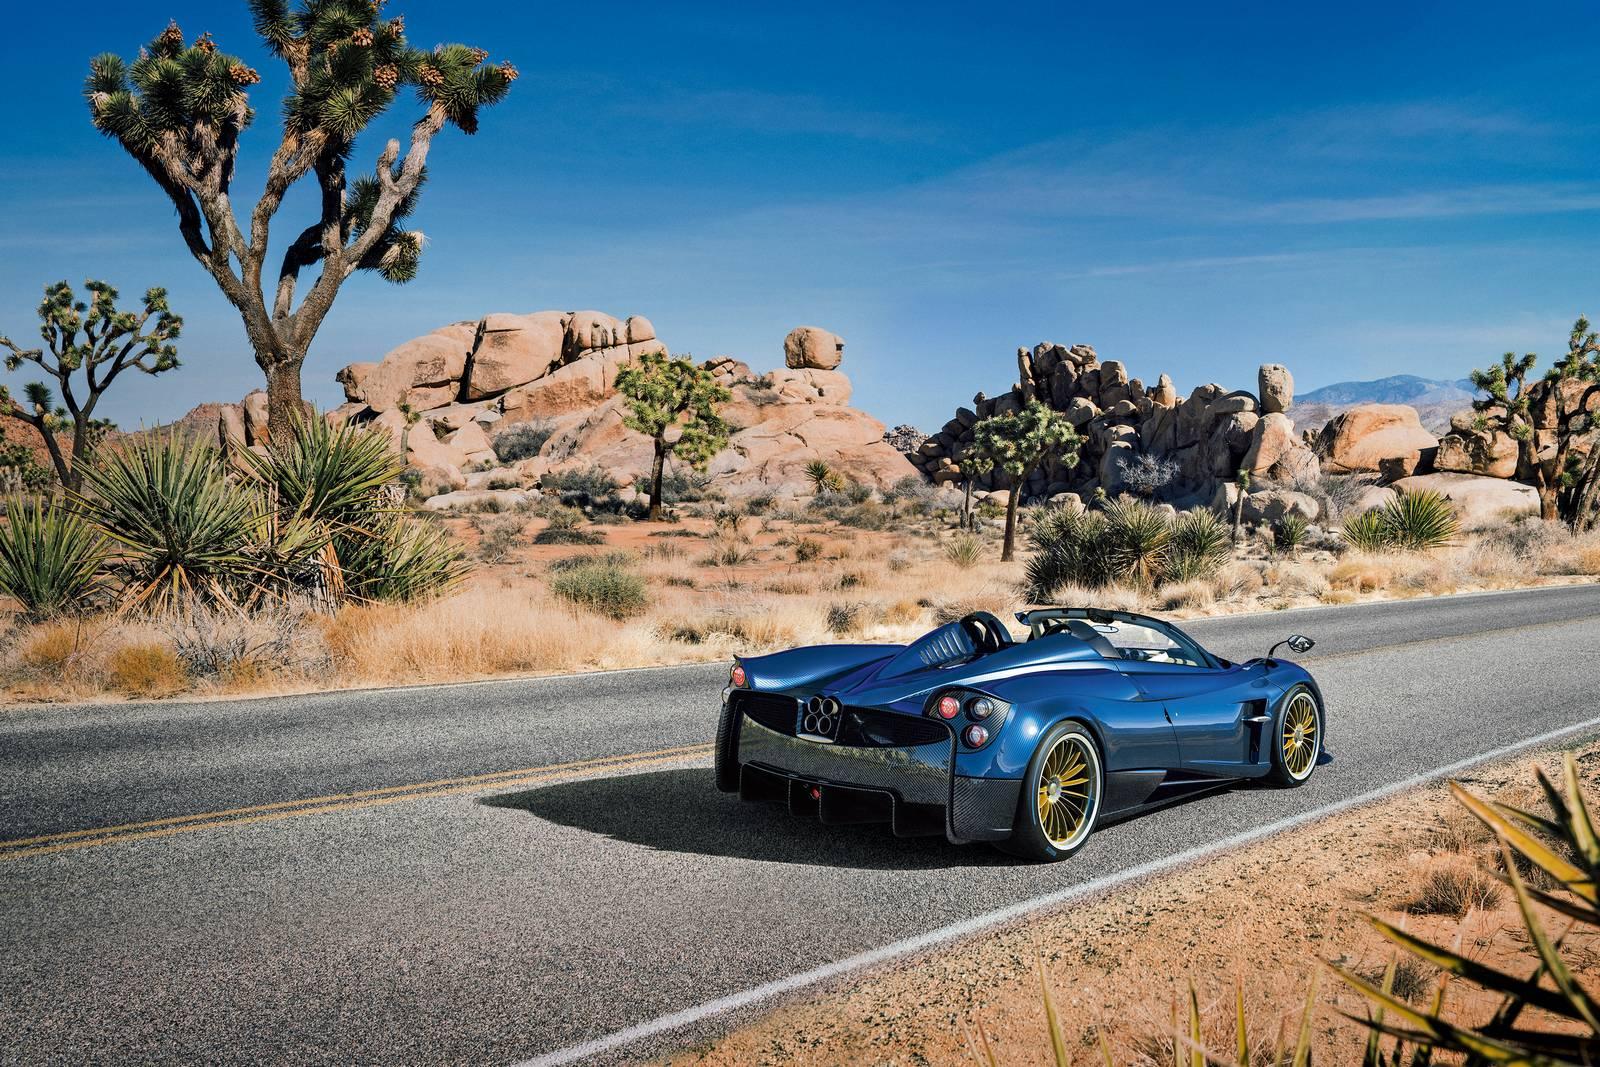 DS pagani huayra roadster : Official: Pagani Huayra Roadster, 100 Units all Sold Out - GTspirit